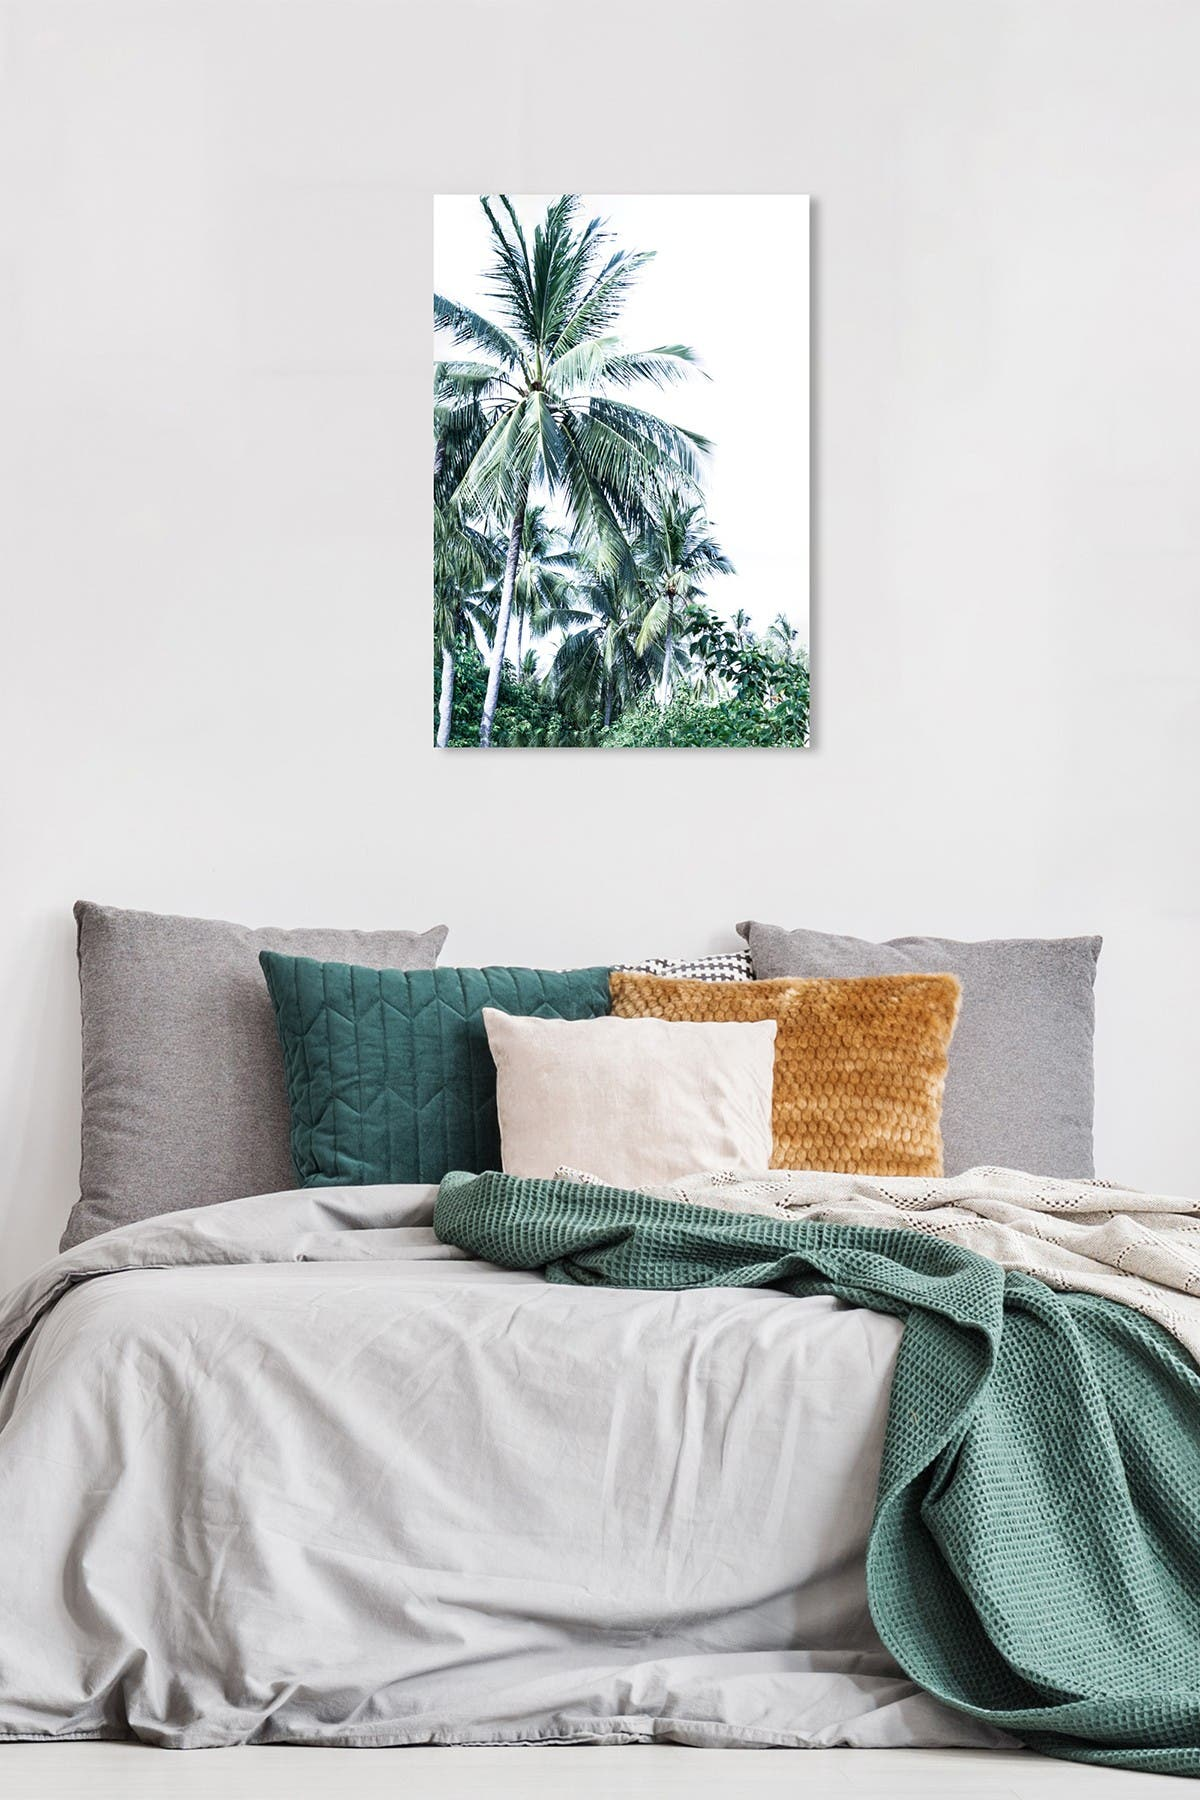 Image of Wynwood Studio On Palm Time Vert Green Wall Art